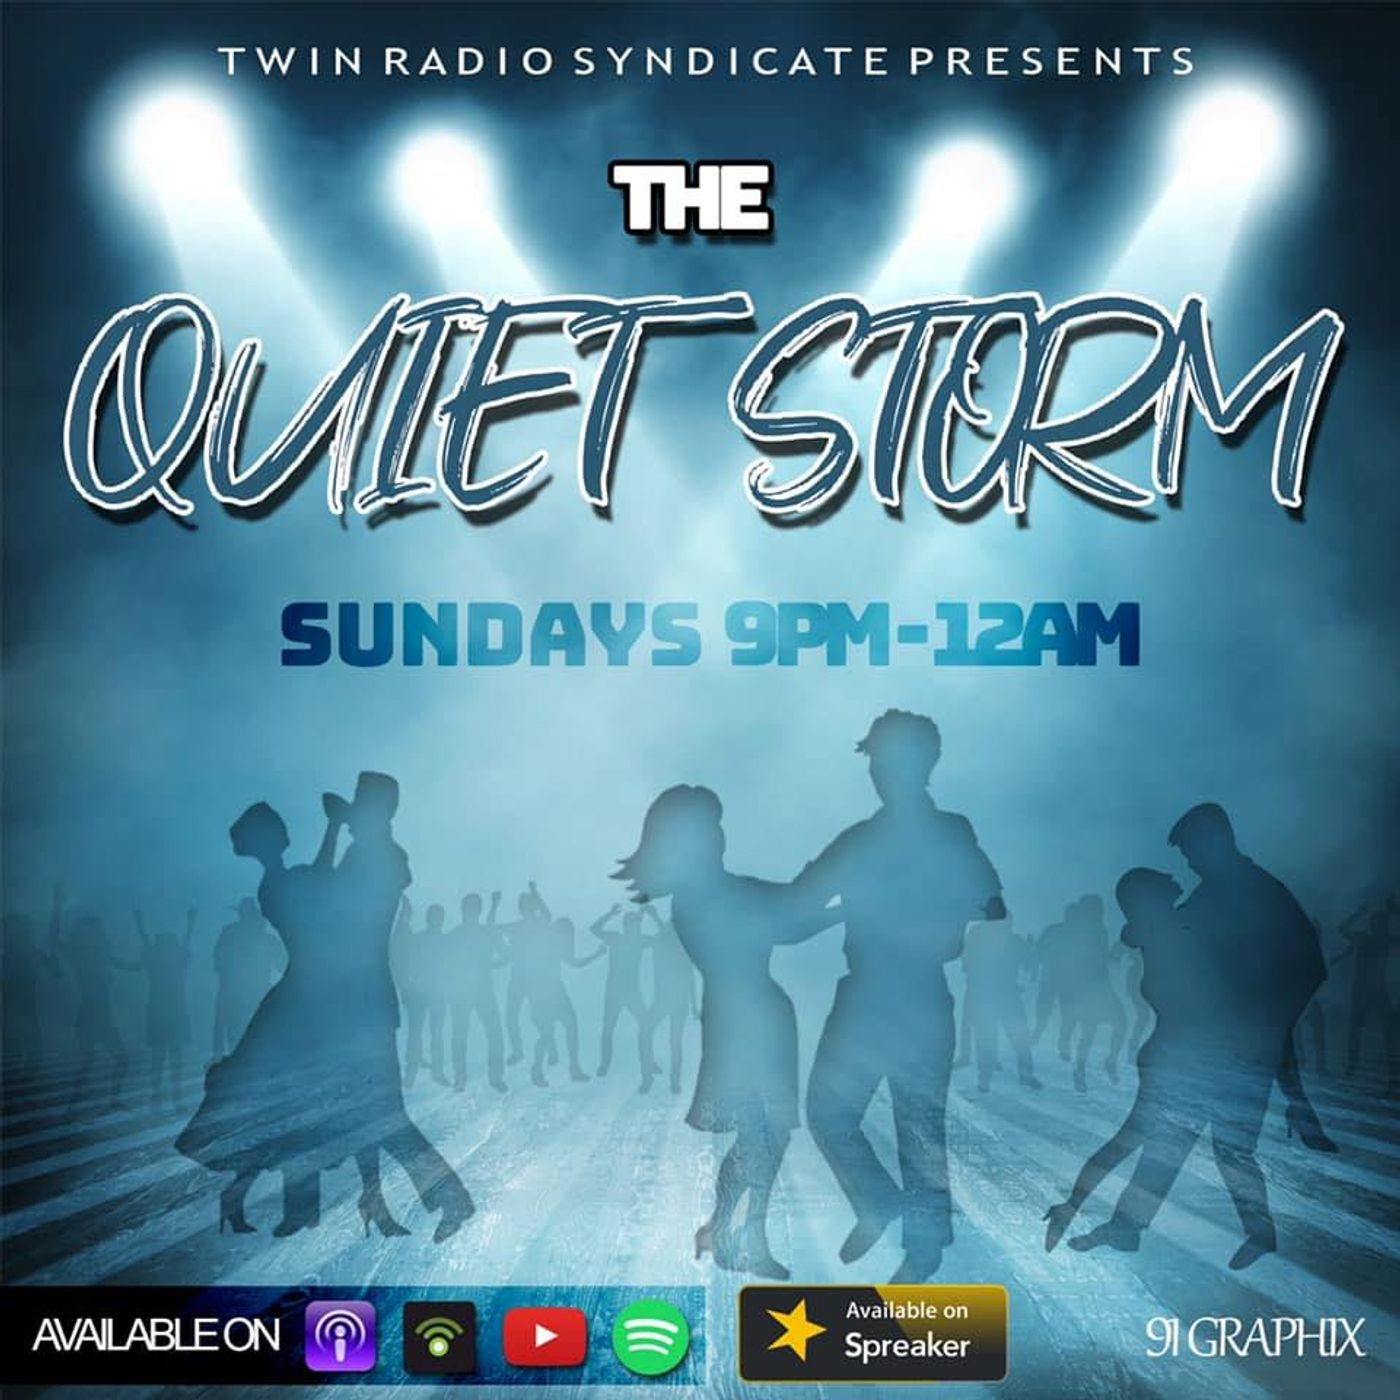 The Quiet Storm w/Dem Twins